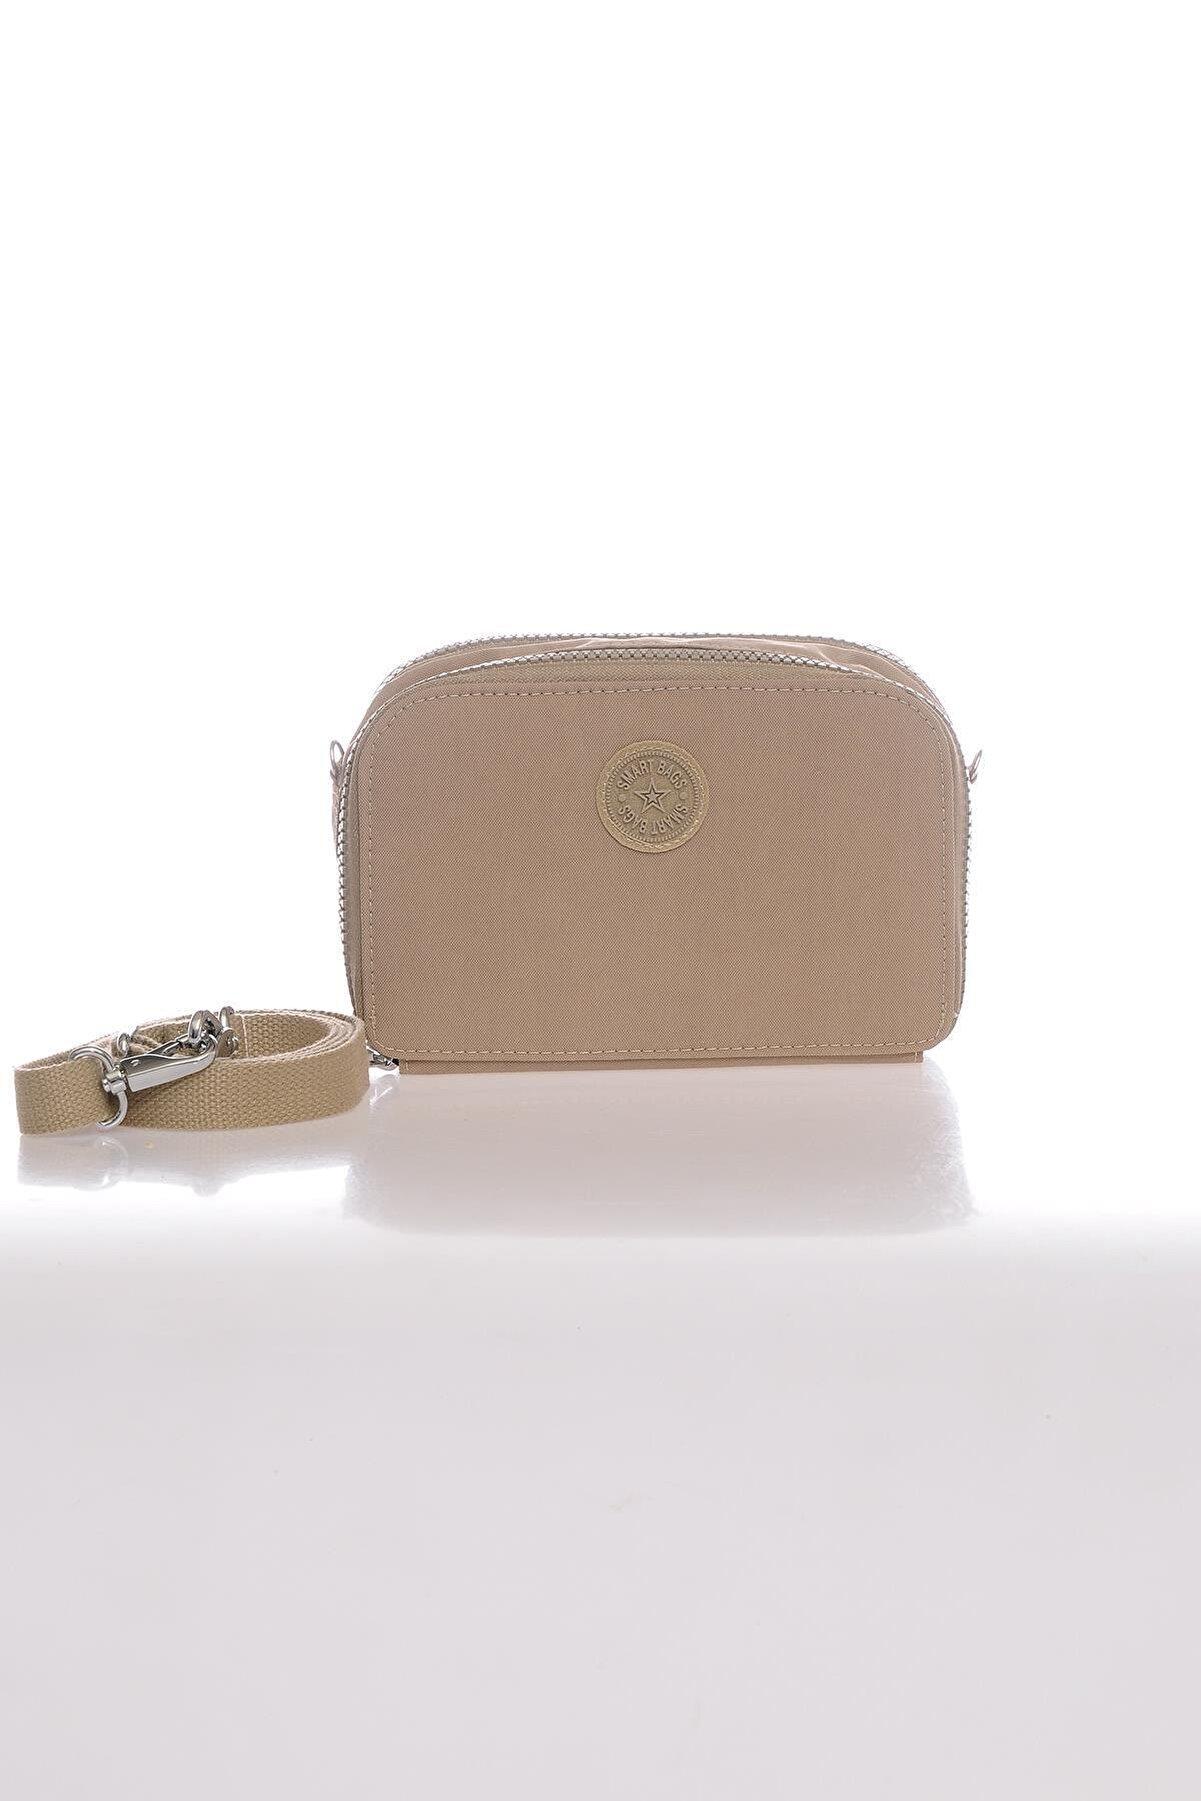 Smart Bags Smb3038-0015 Vizon Kadın Portföy